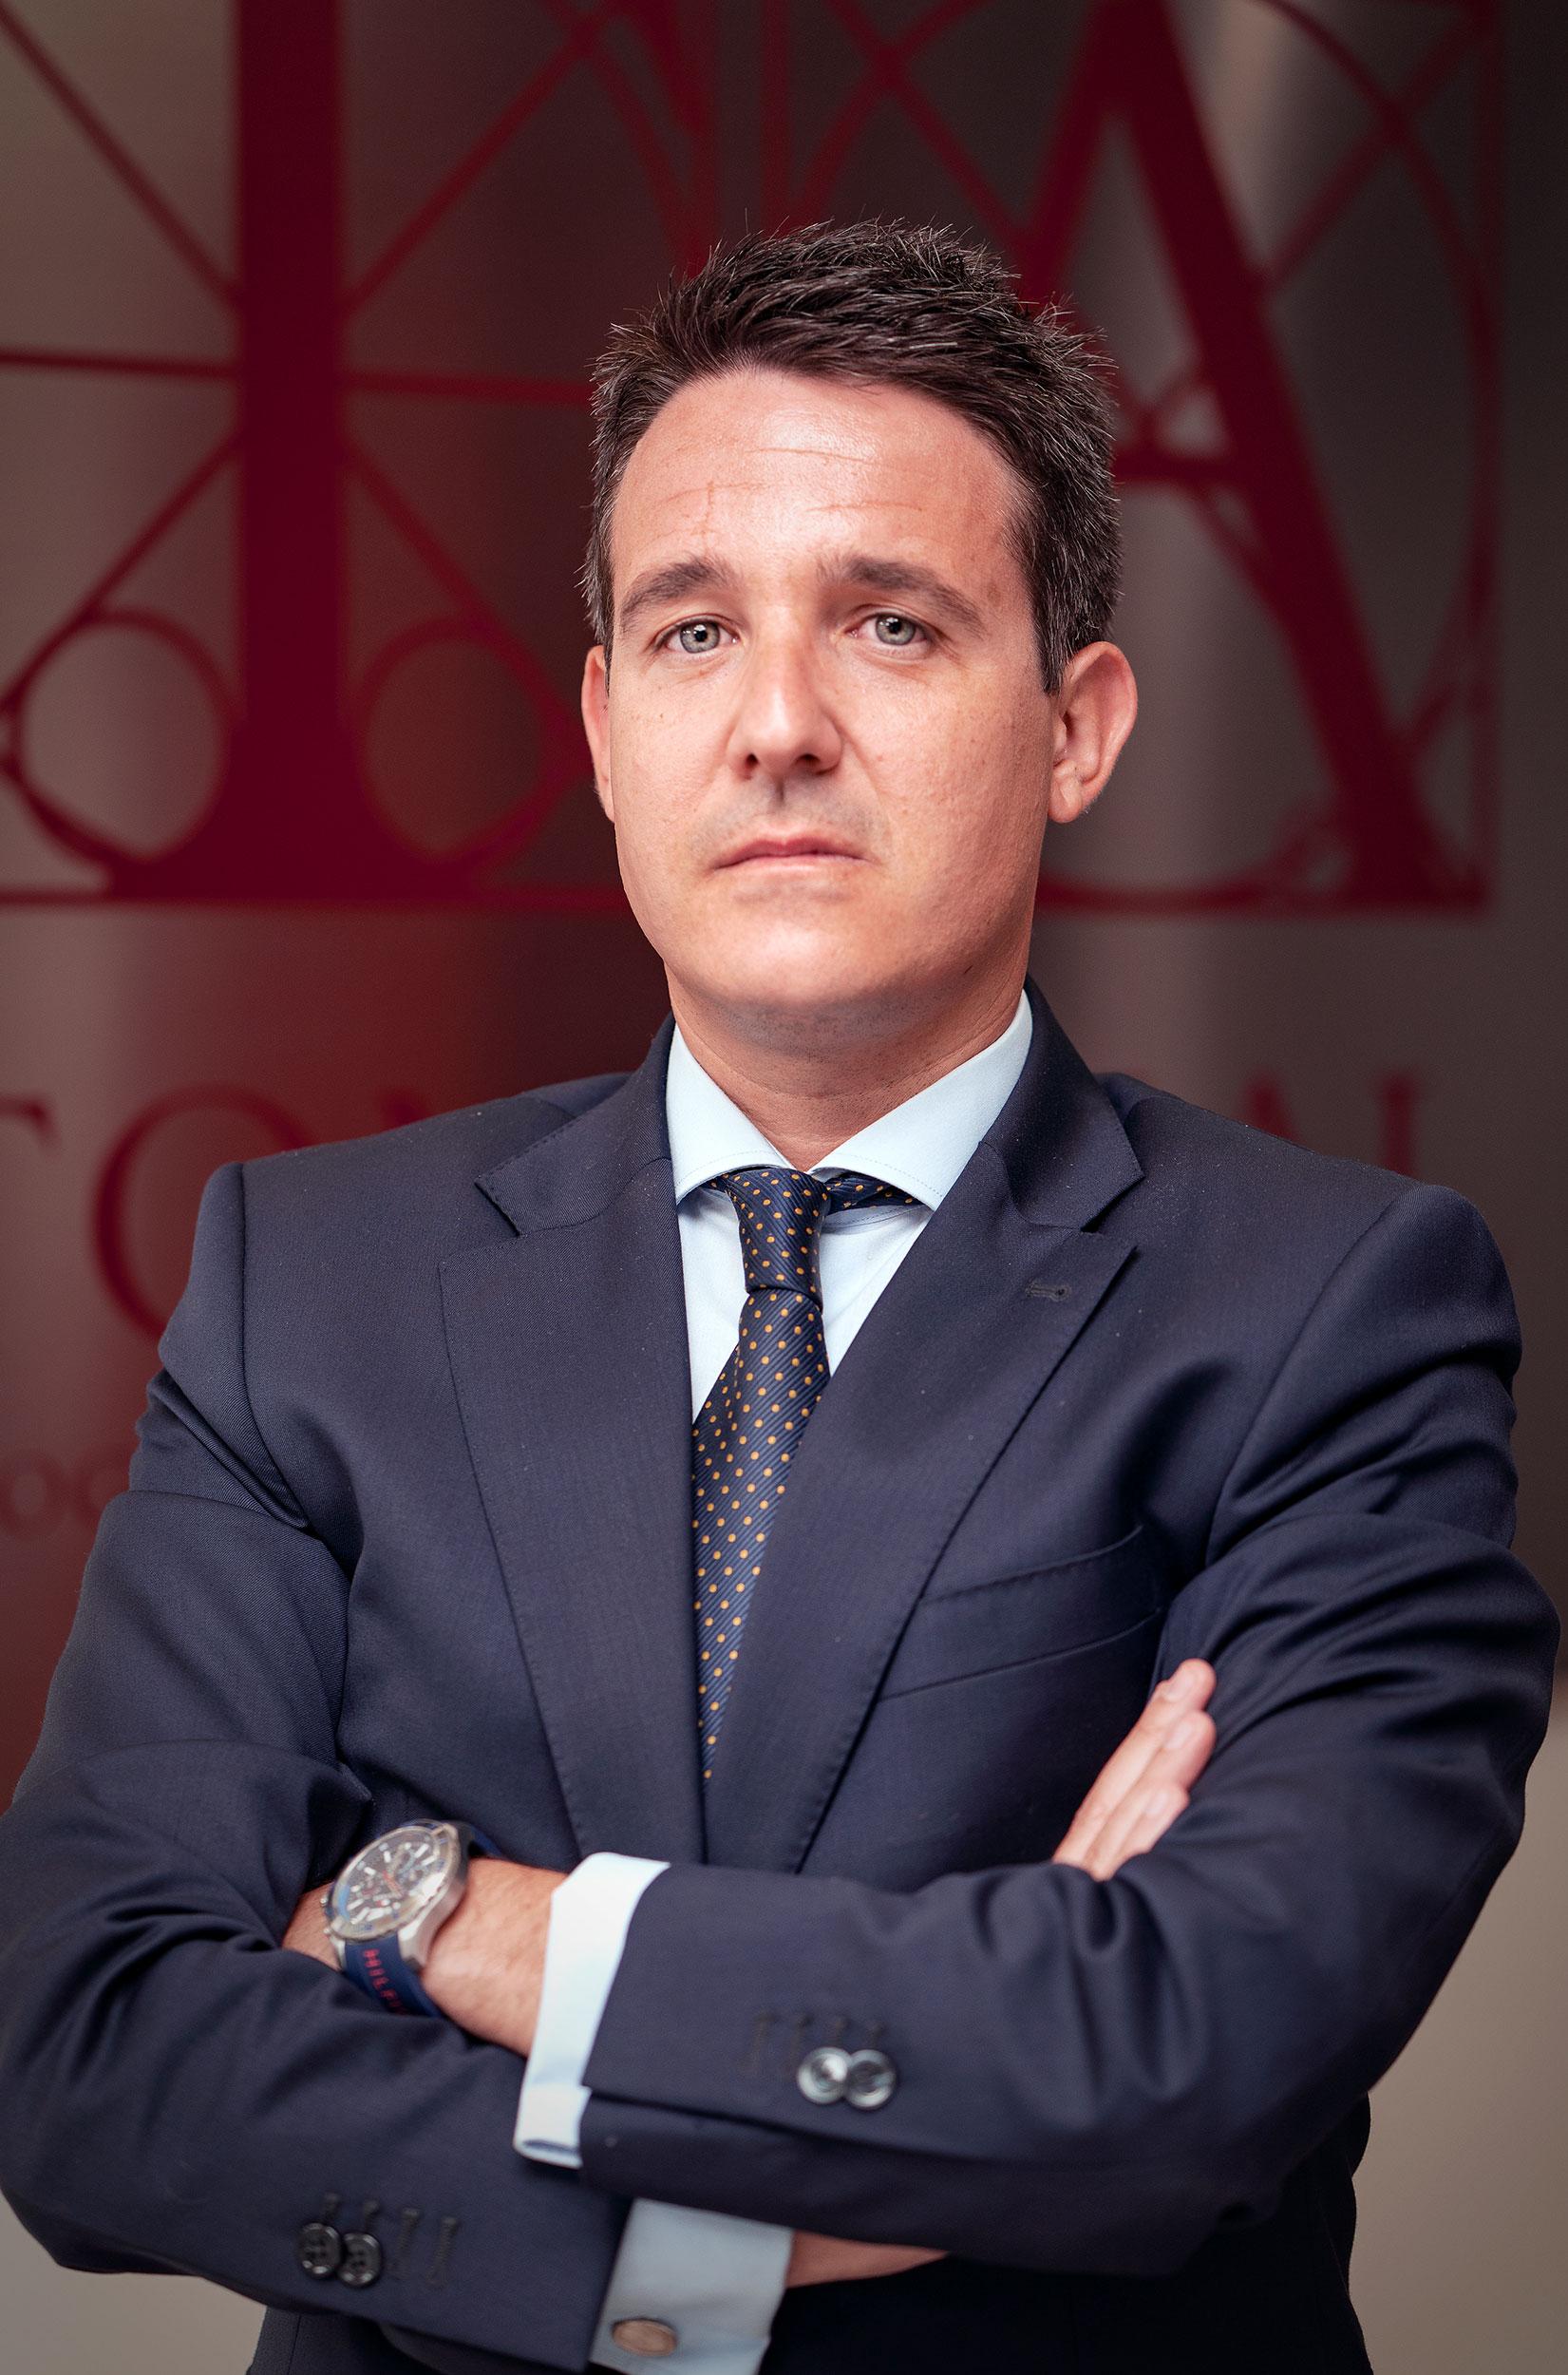 Miguel Angel Molina Martinez